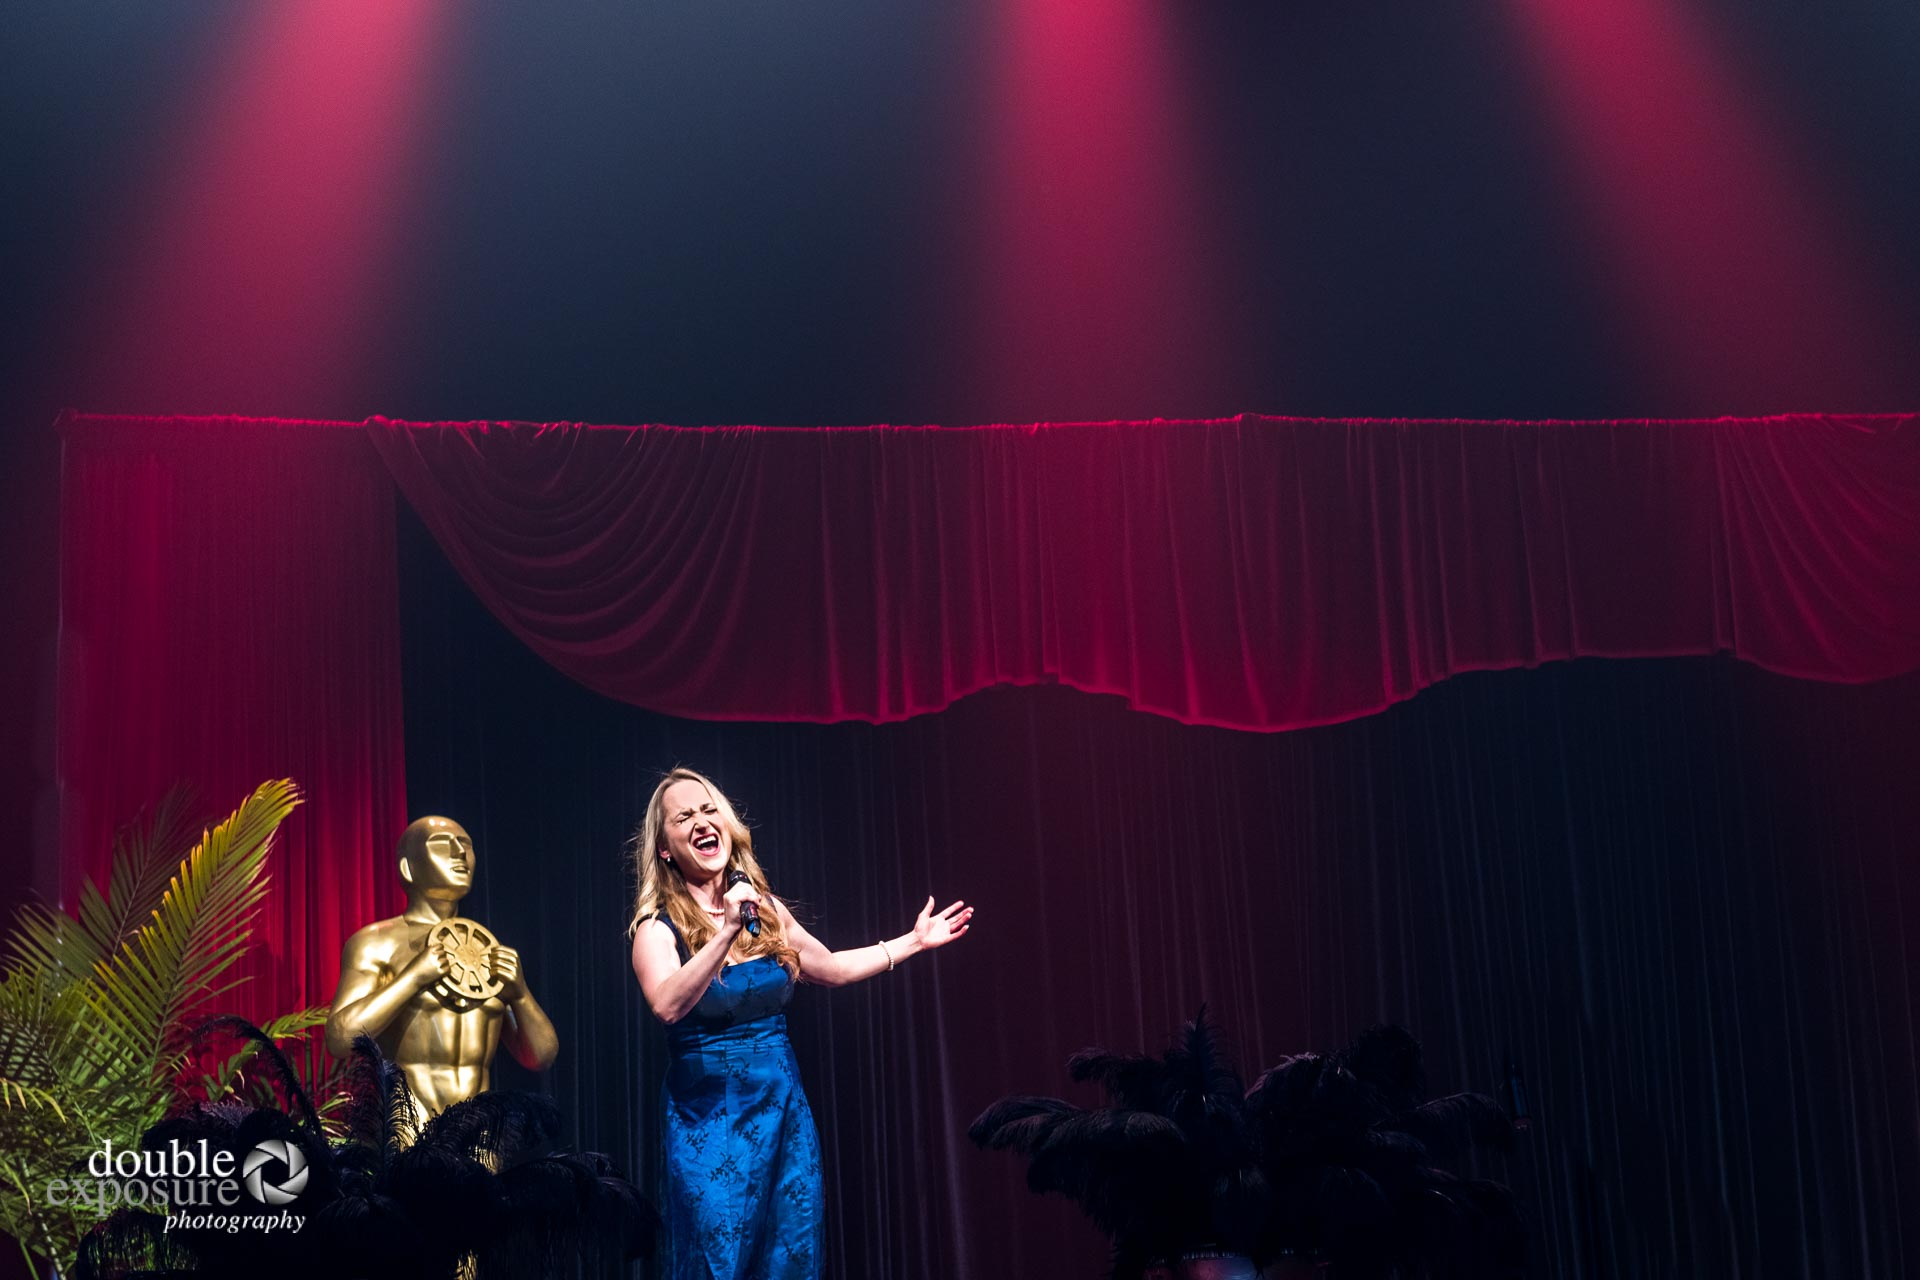 Tiffany Desrosier performing on stage